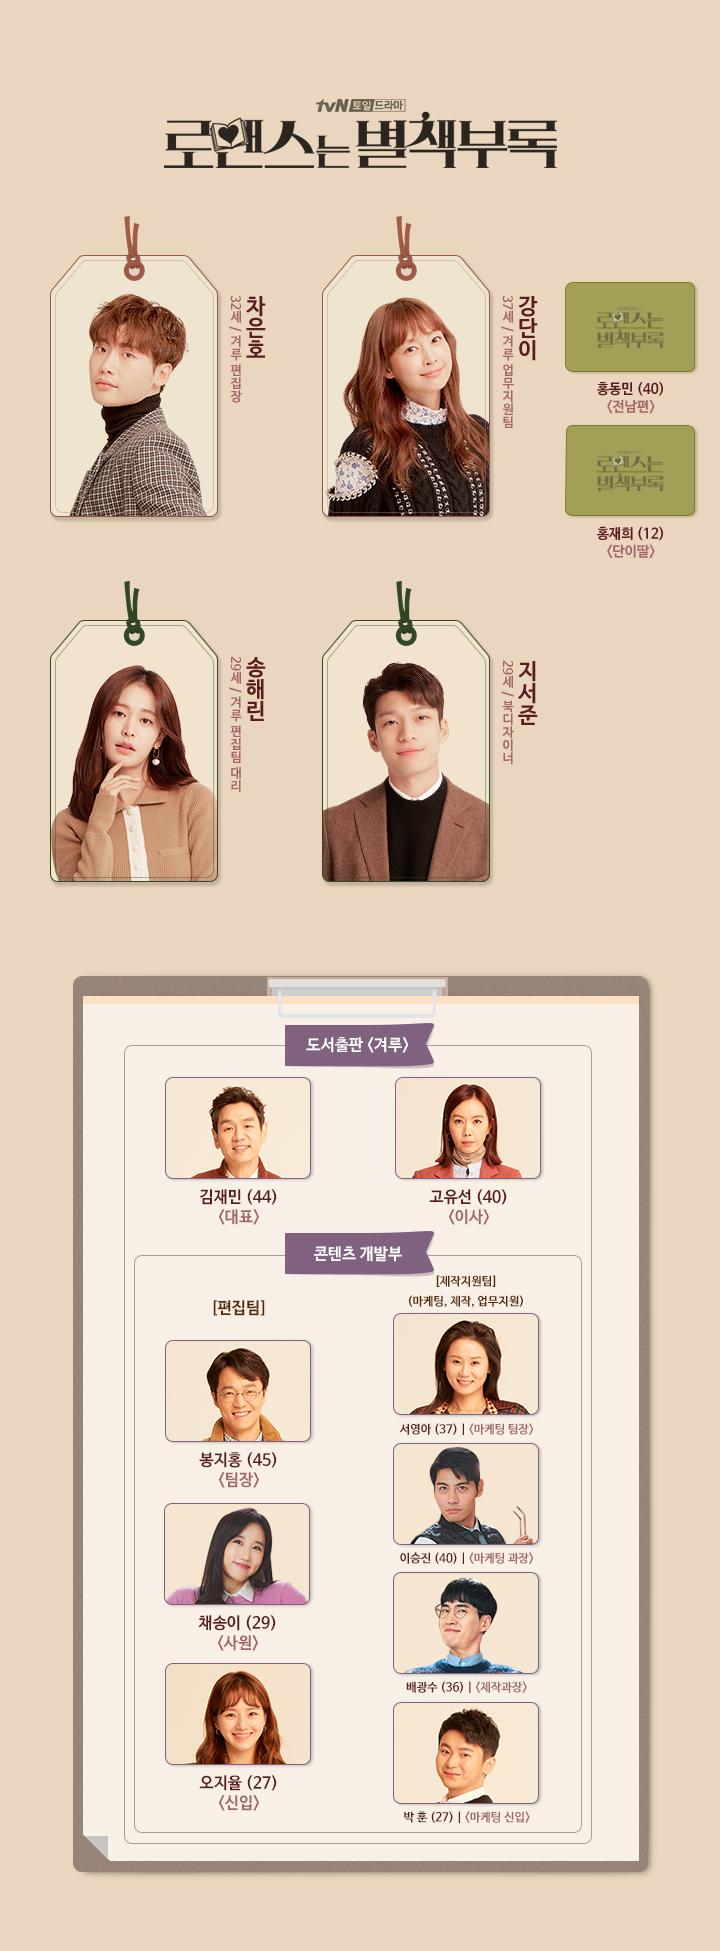 tvN '로맨스는 별책부록' 인물관계도